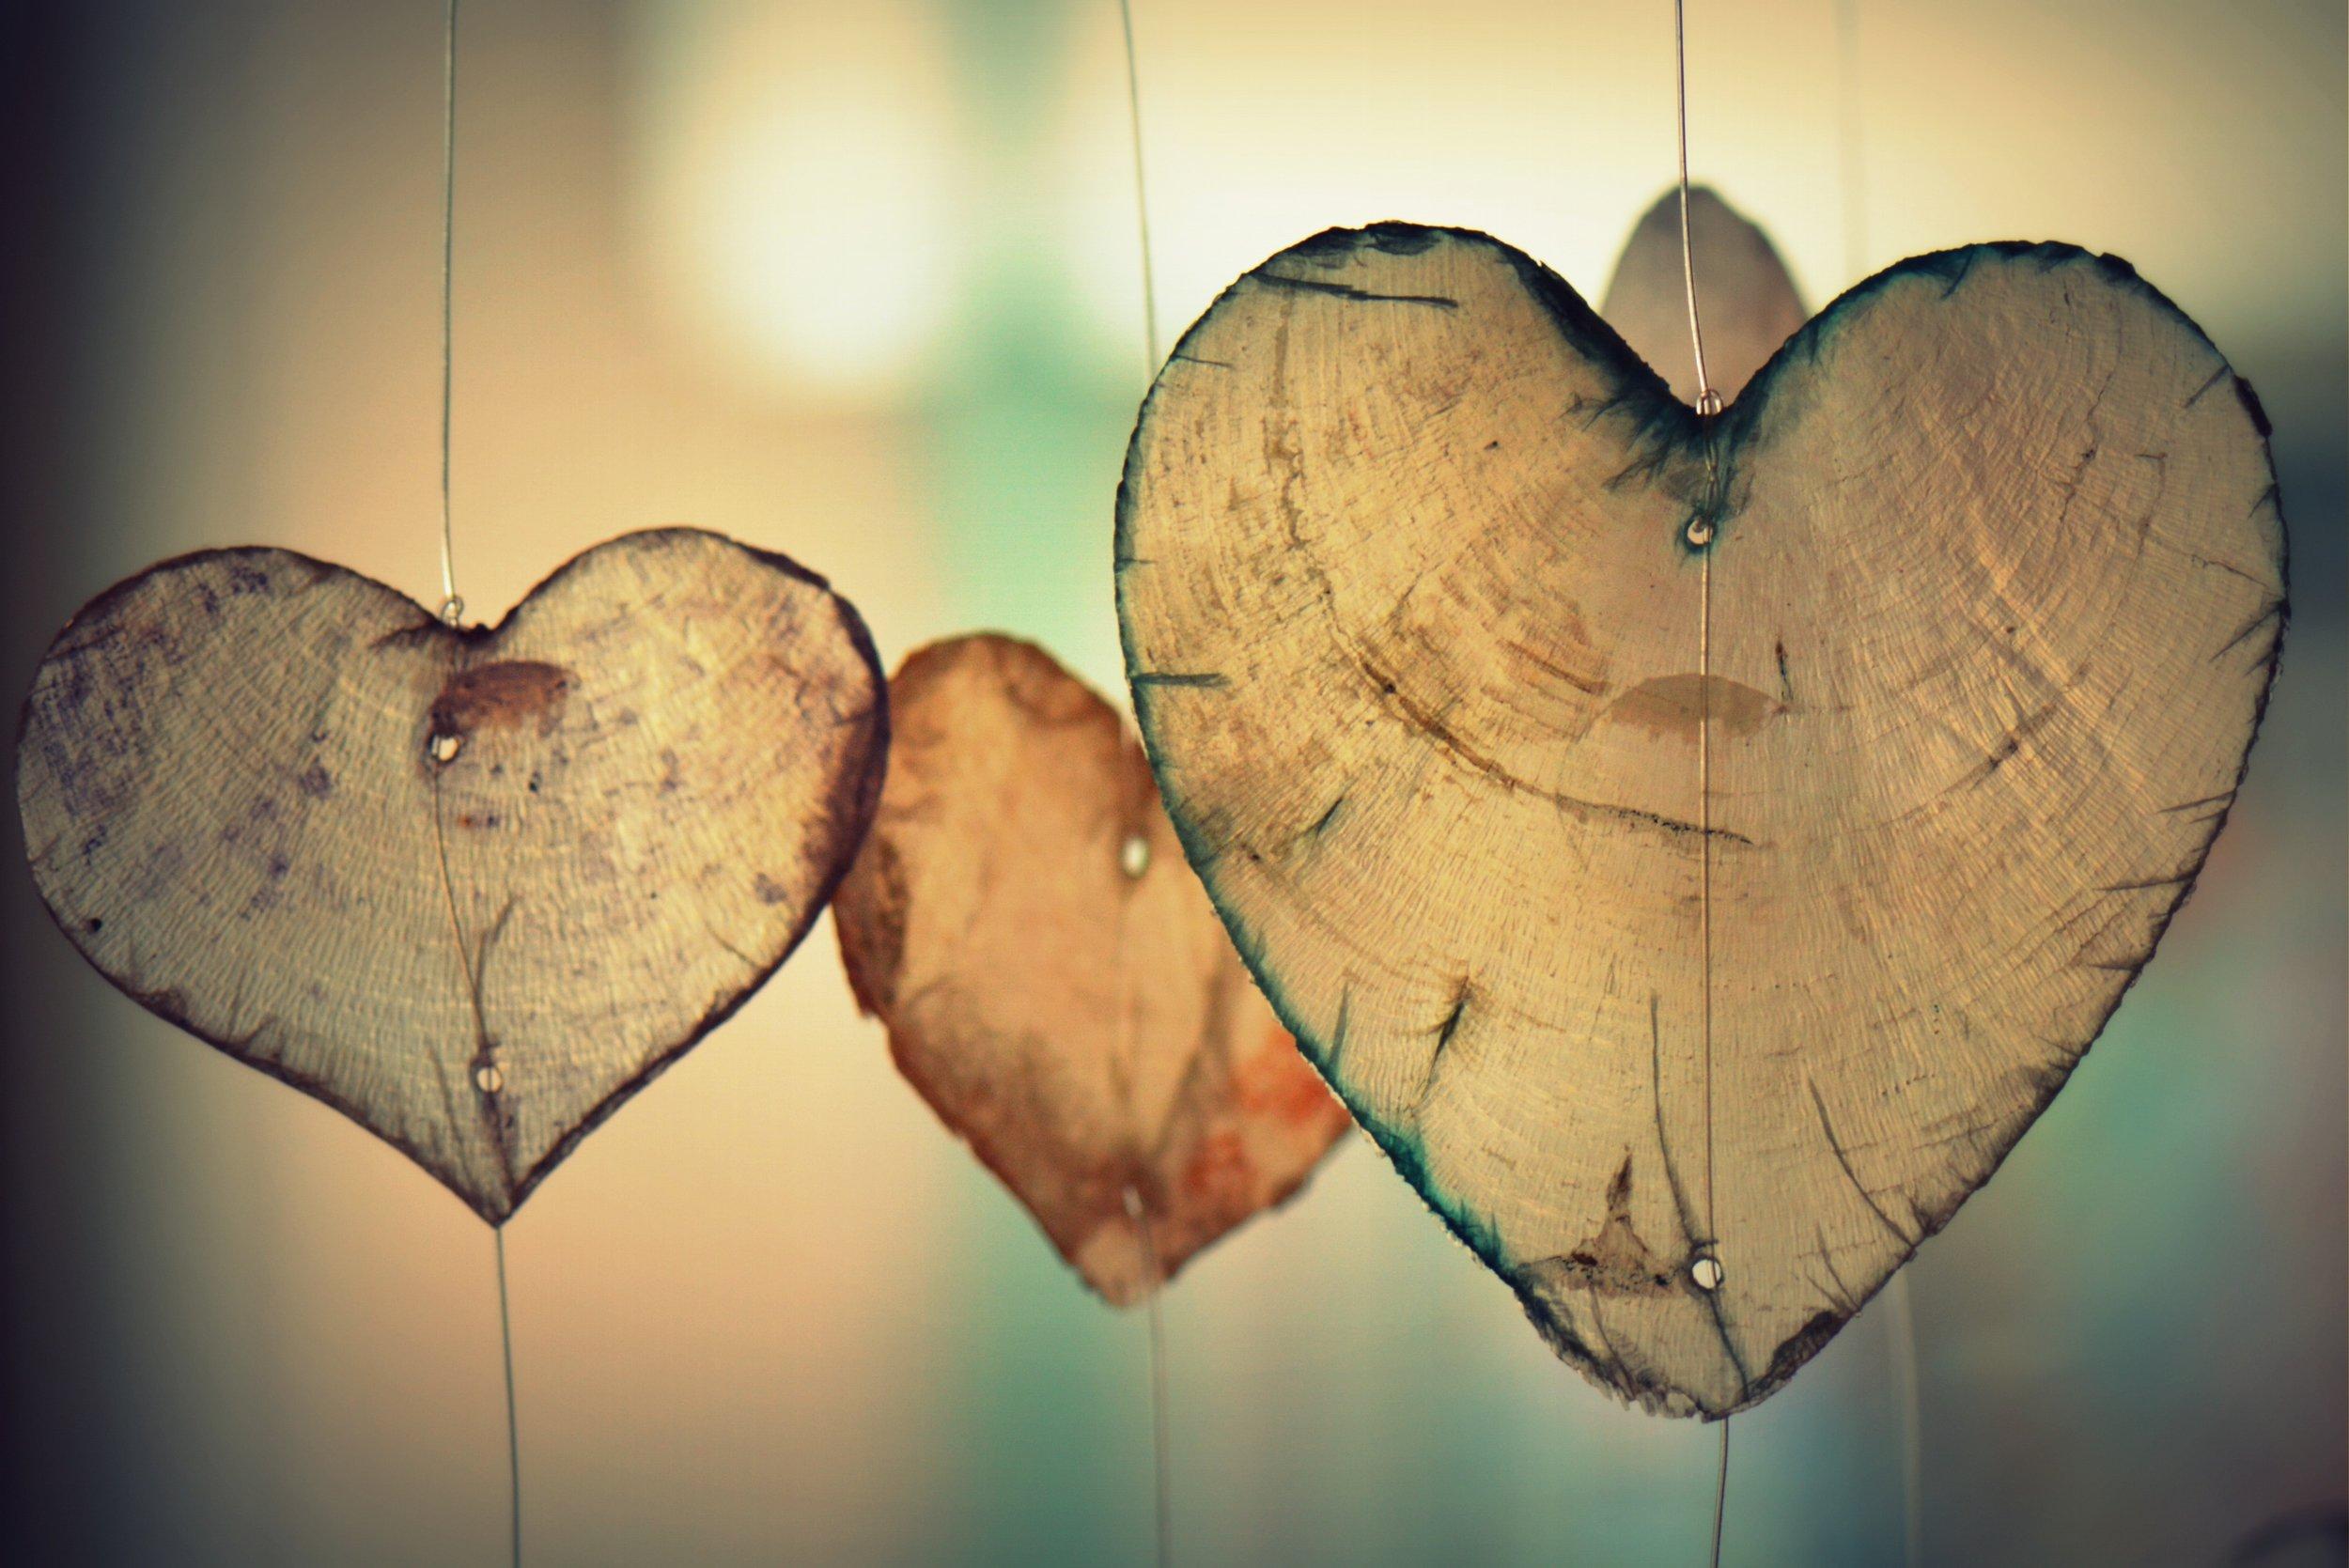 heart-romance-romantic-37410.jpg